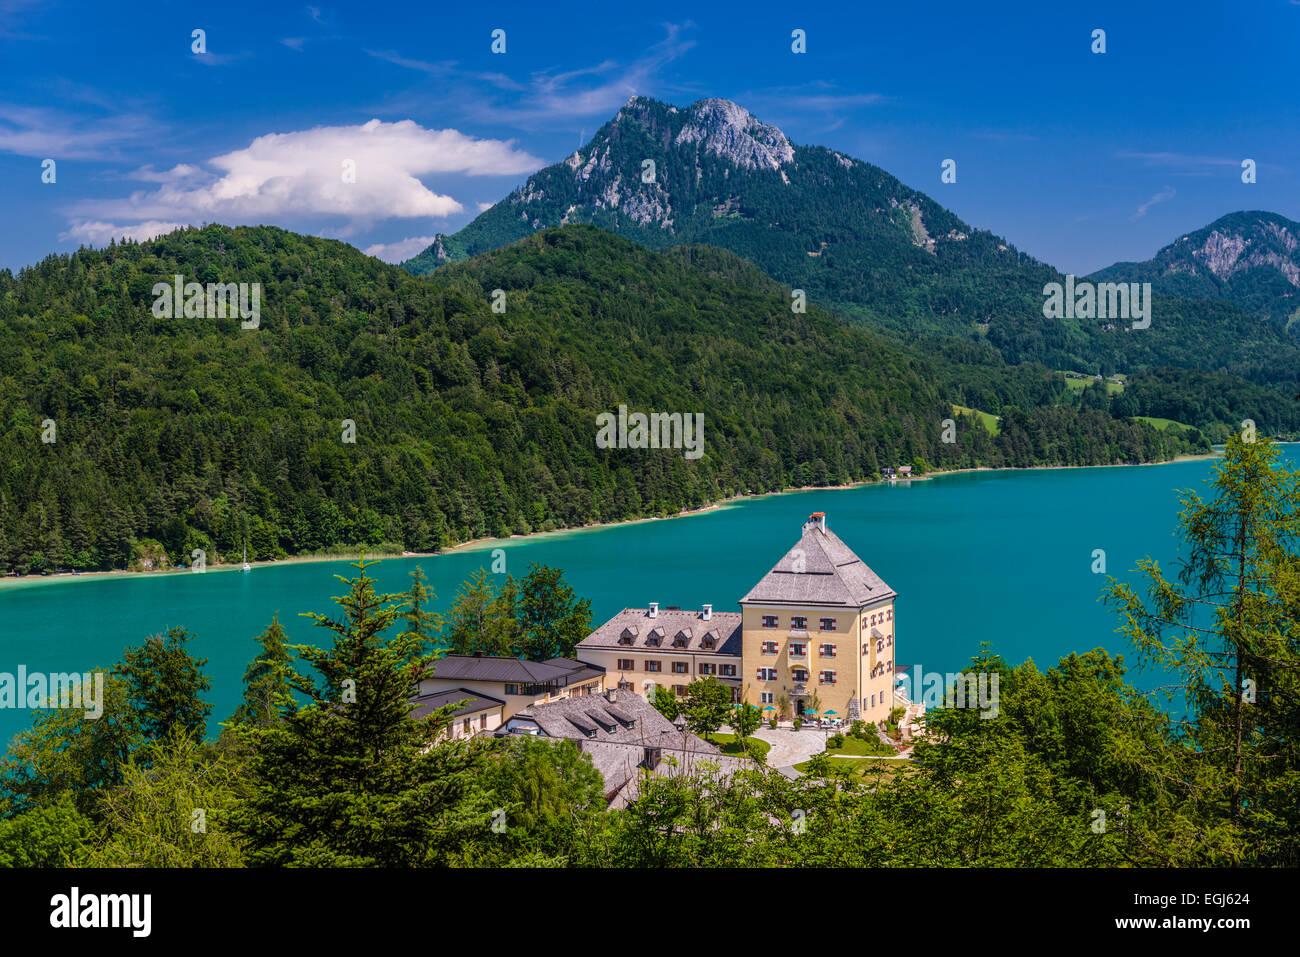 Hotel Salzkammergut See